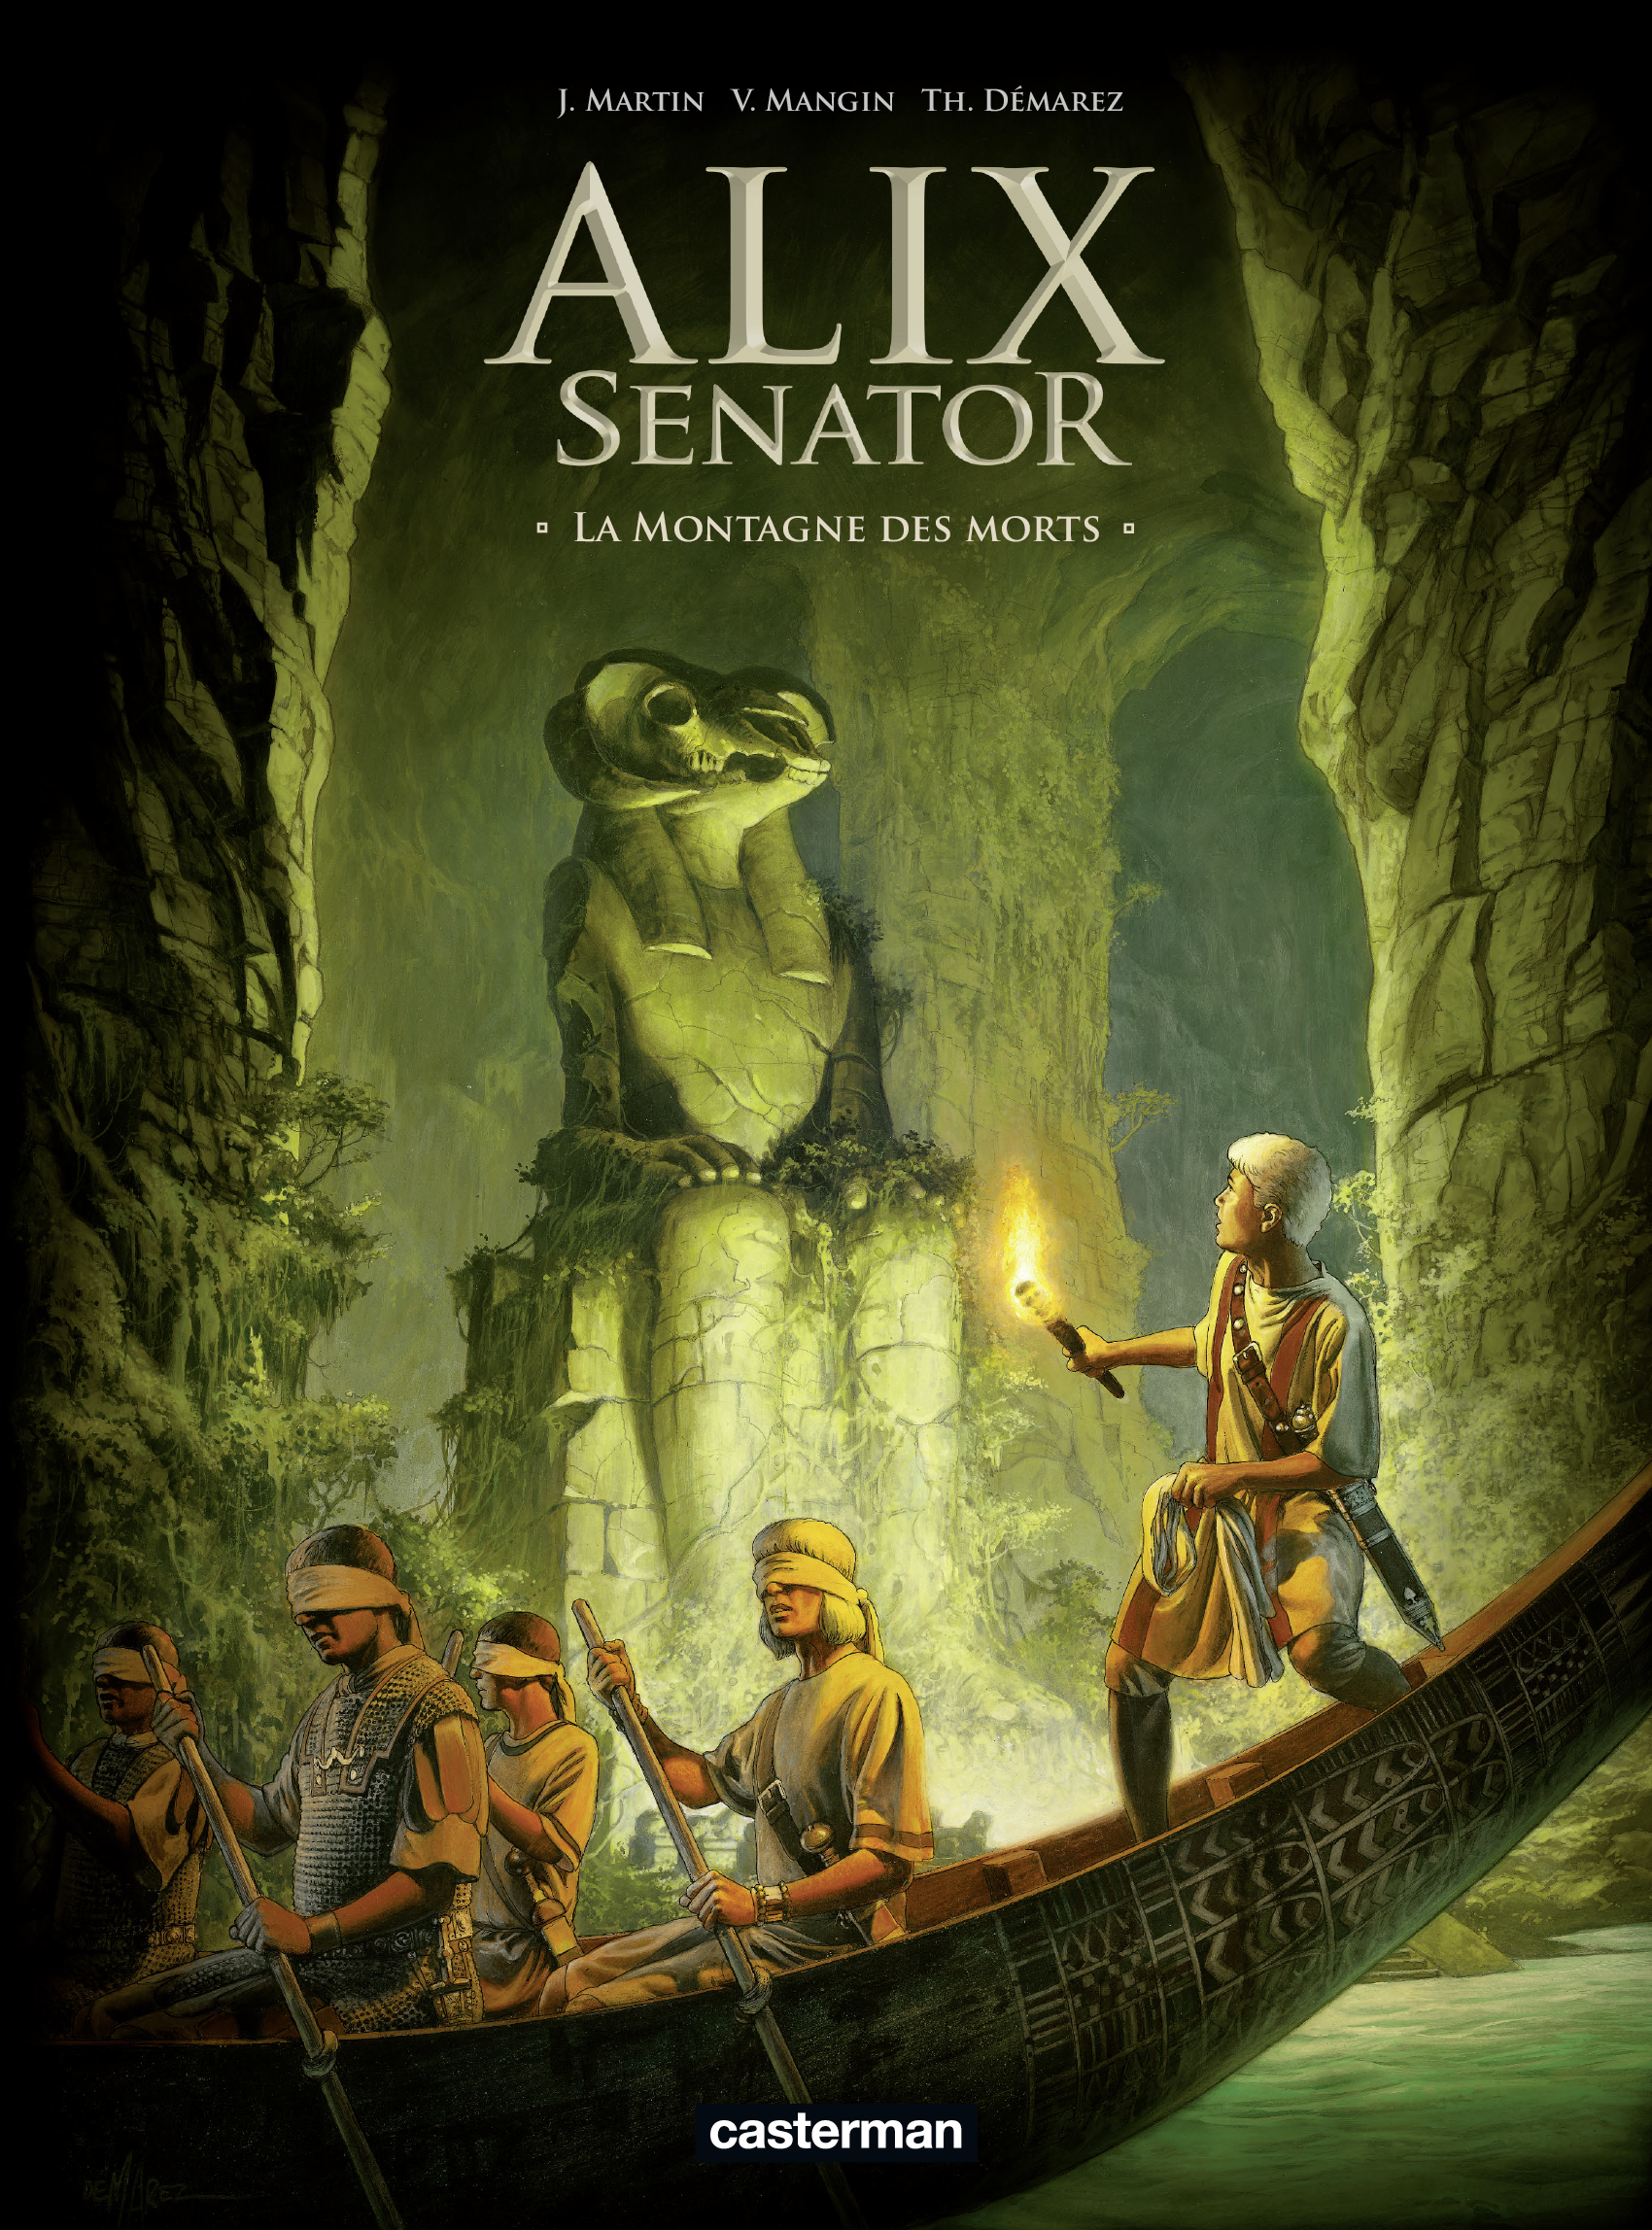 Alix Senator (Tome 6) - La Montagne des Morts